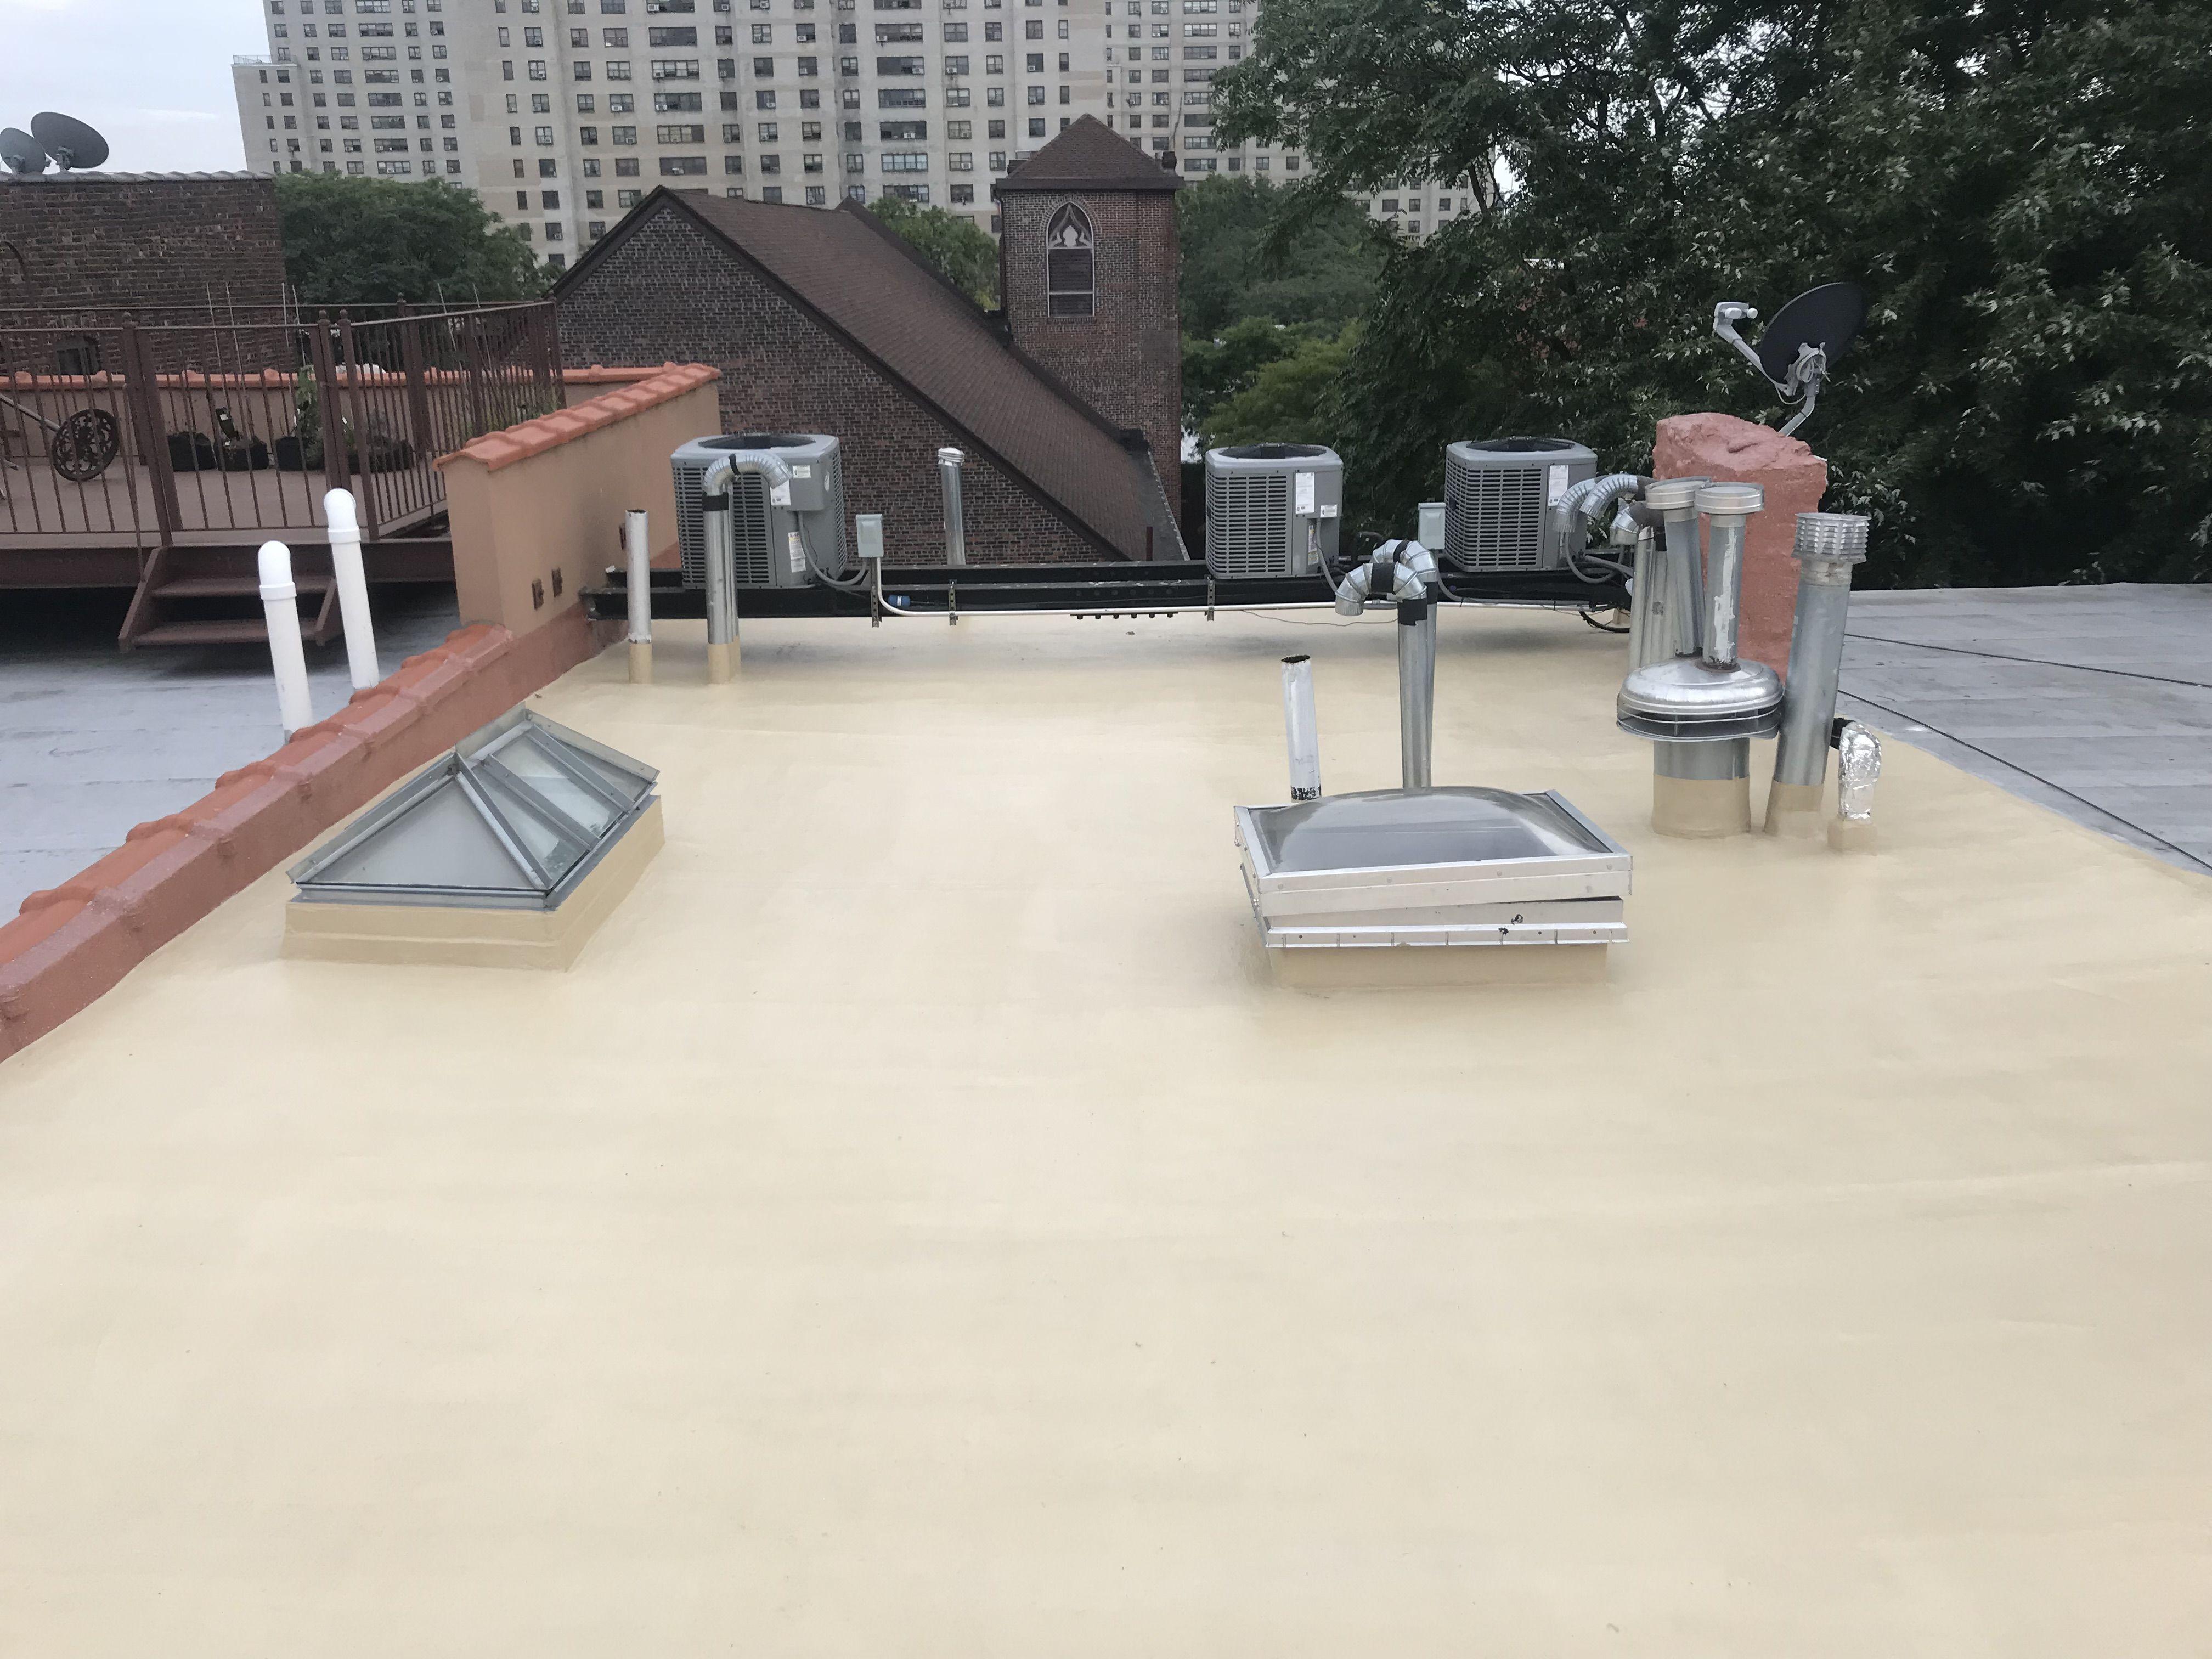 Brownstone Roof Renovation Brooklyn Roof Renovation Flat Roof Roof